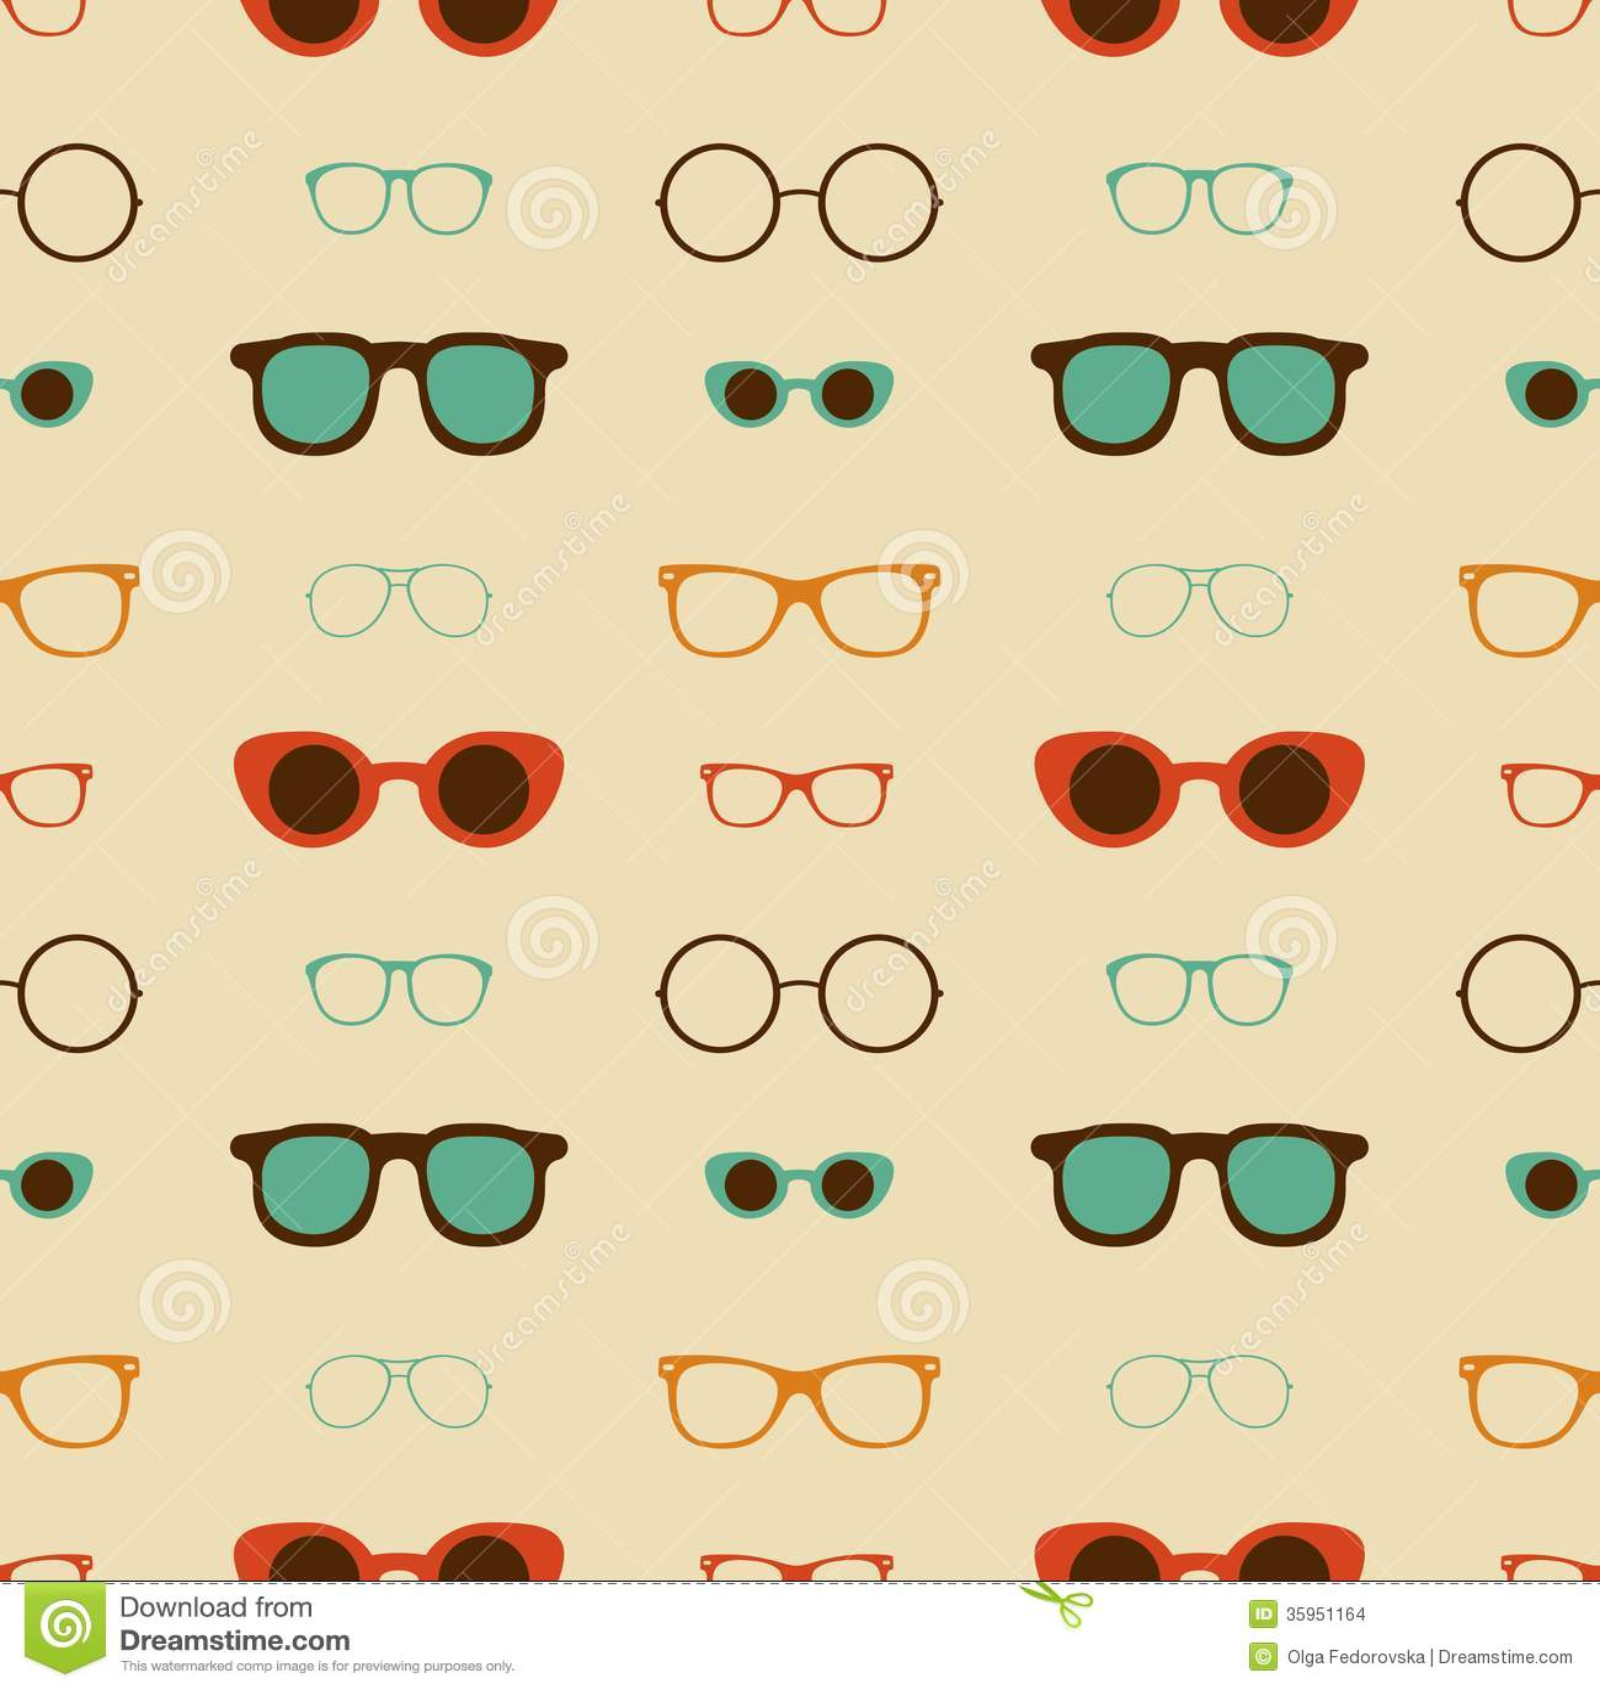 Hipster Glasses Vector Seamless Pattern Stock Vector Illustration